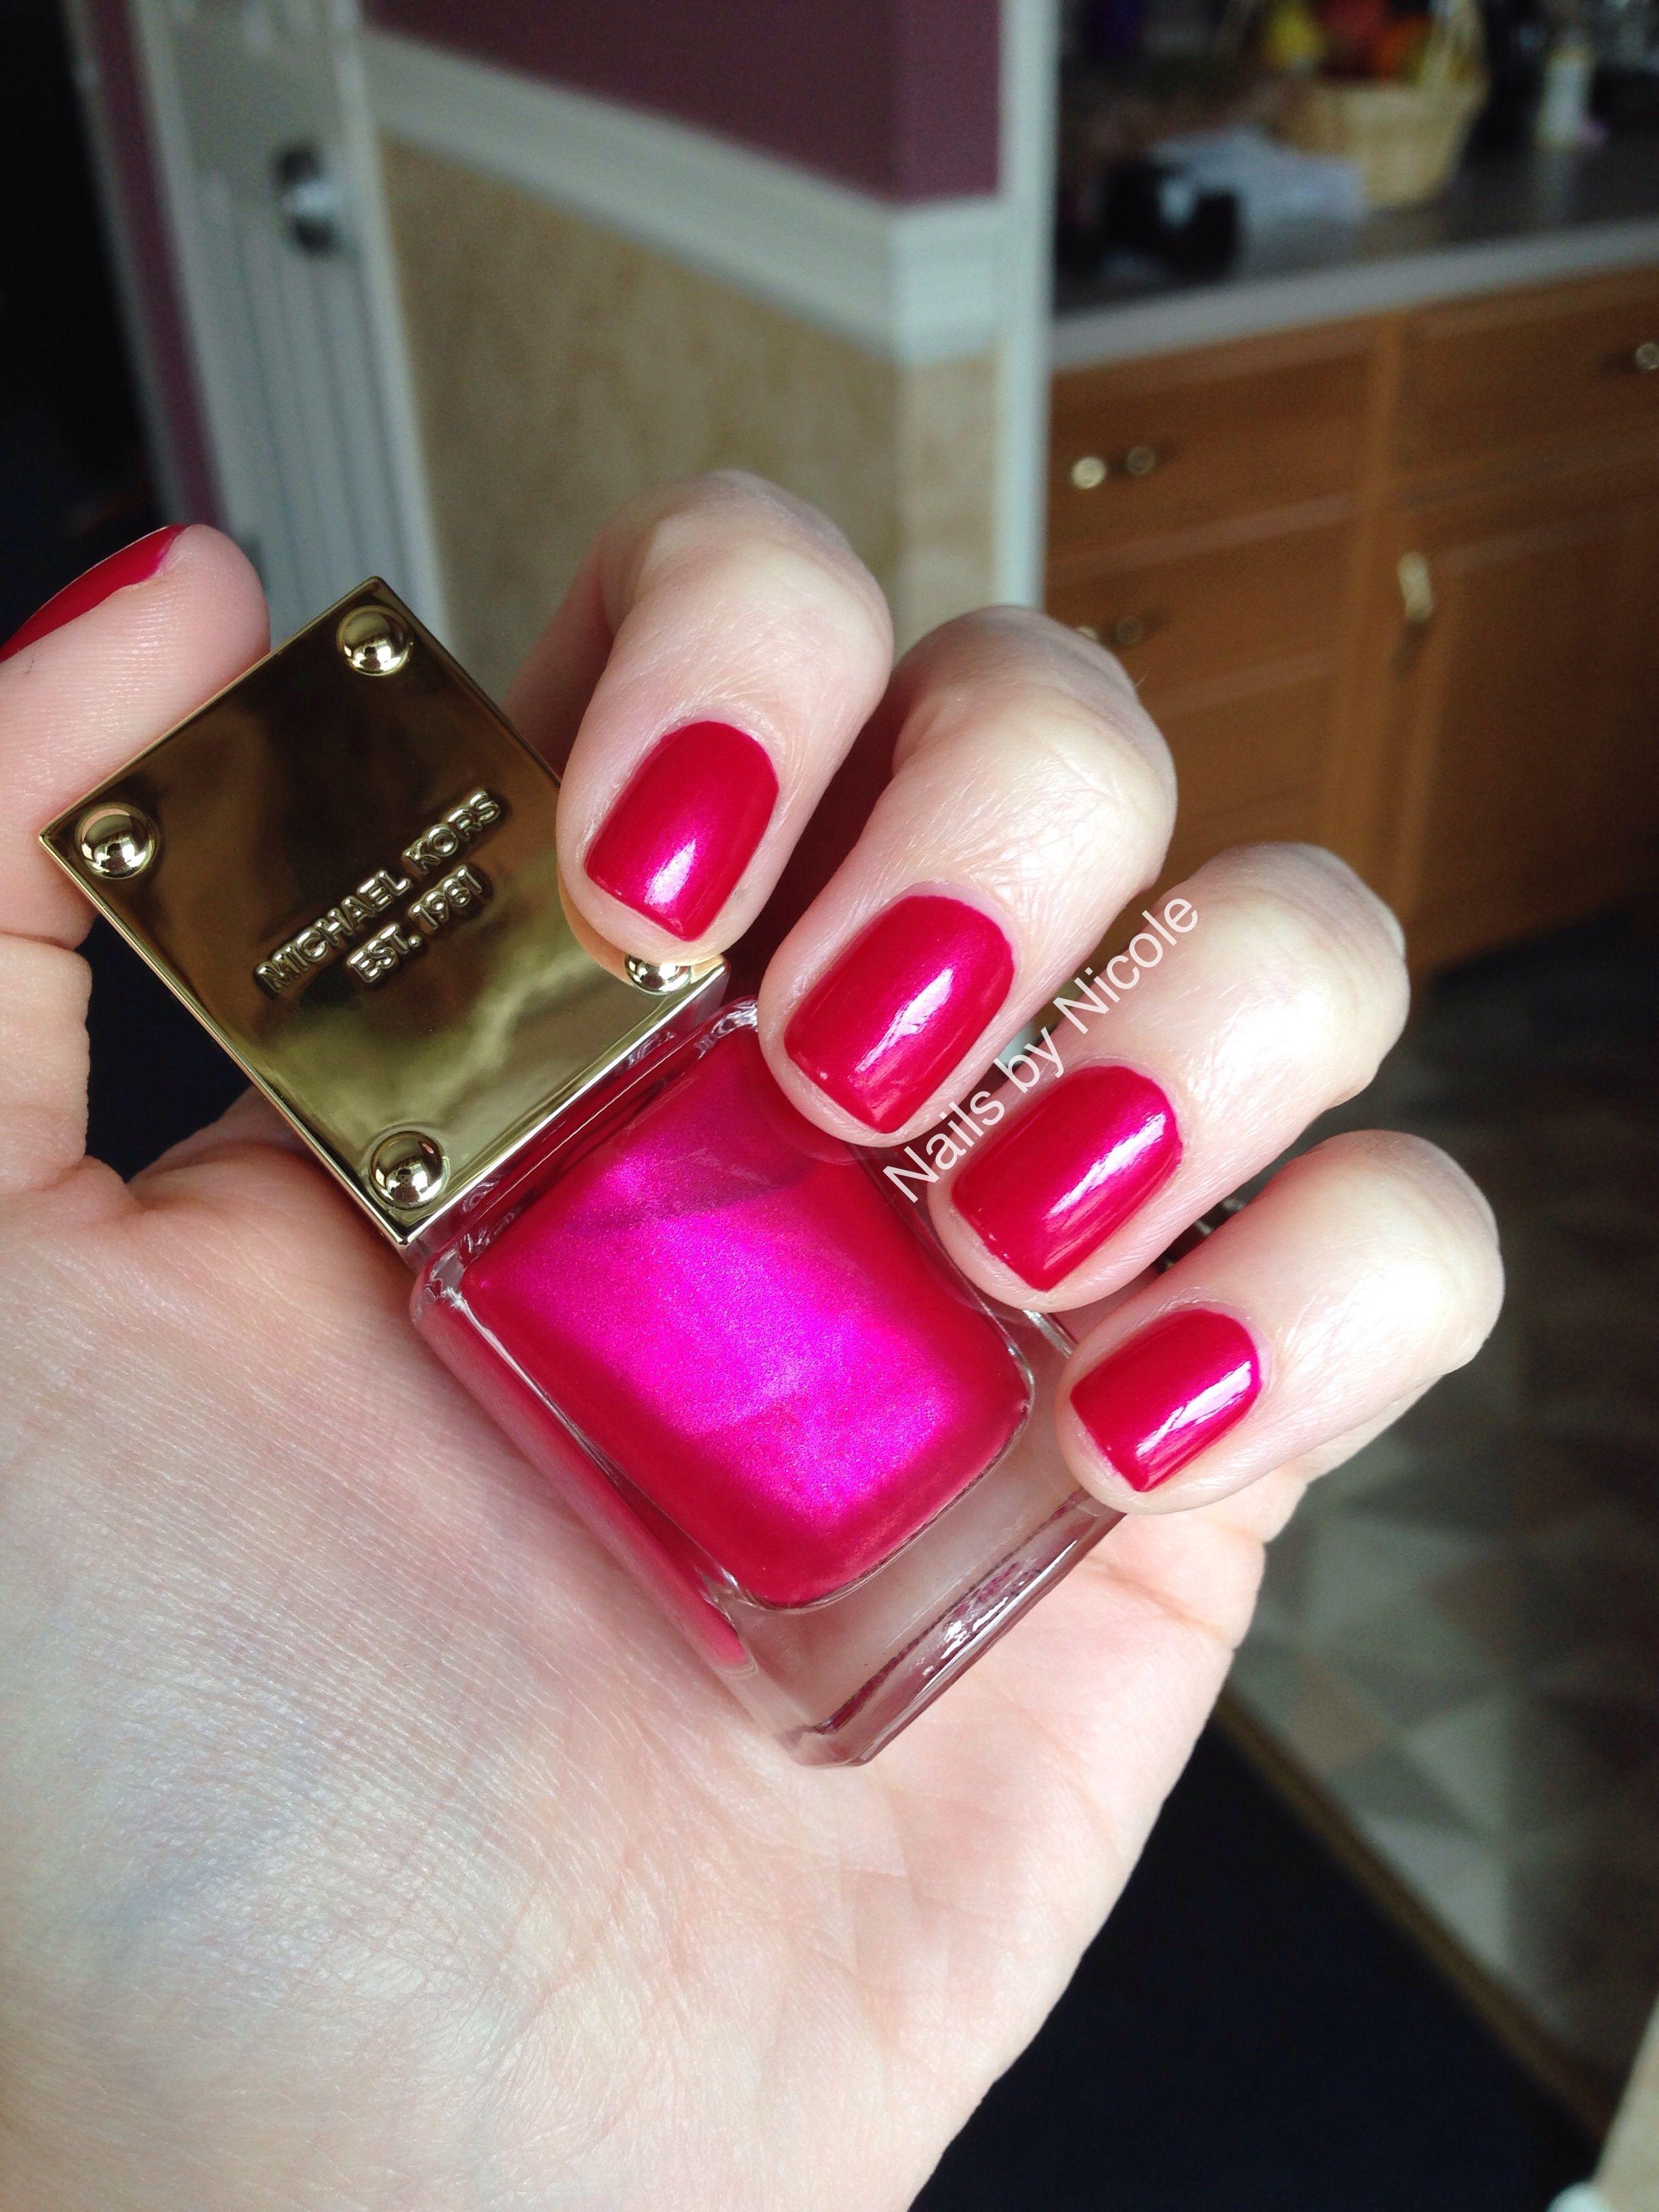 Michael Kors Scandal Nail Polish fuschia jewel tone nails | uñas ...